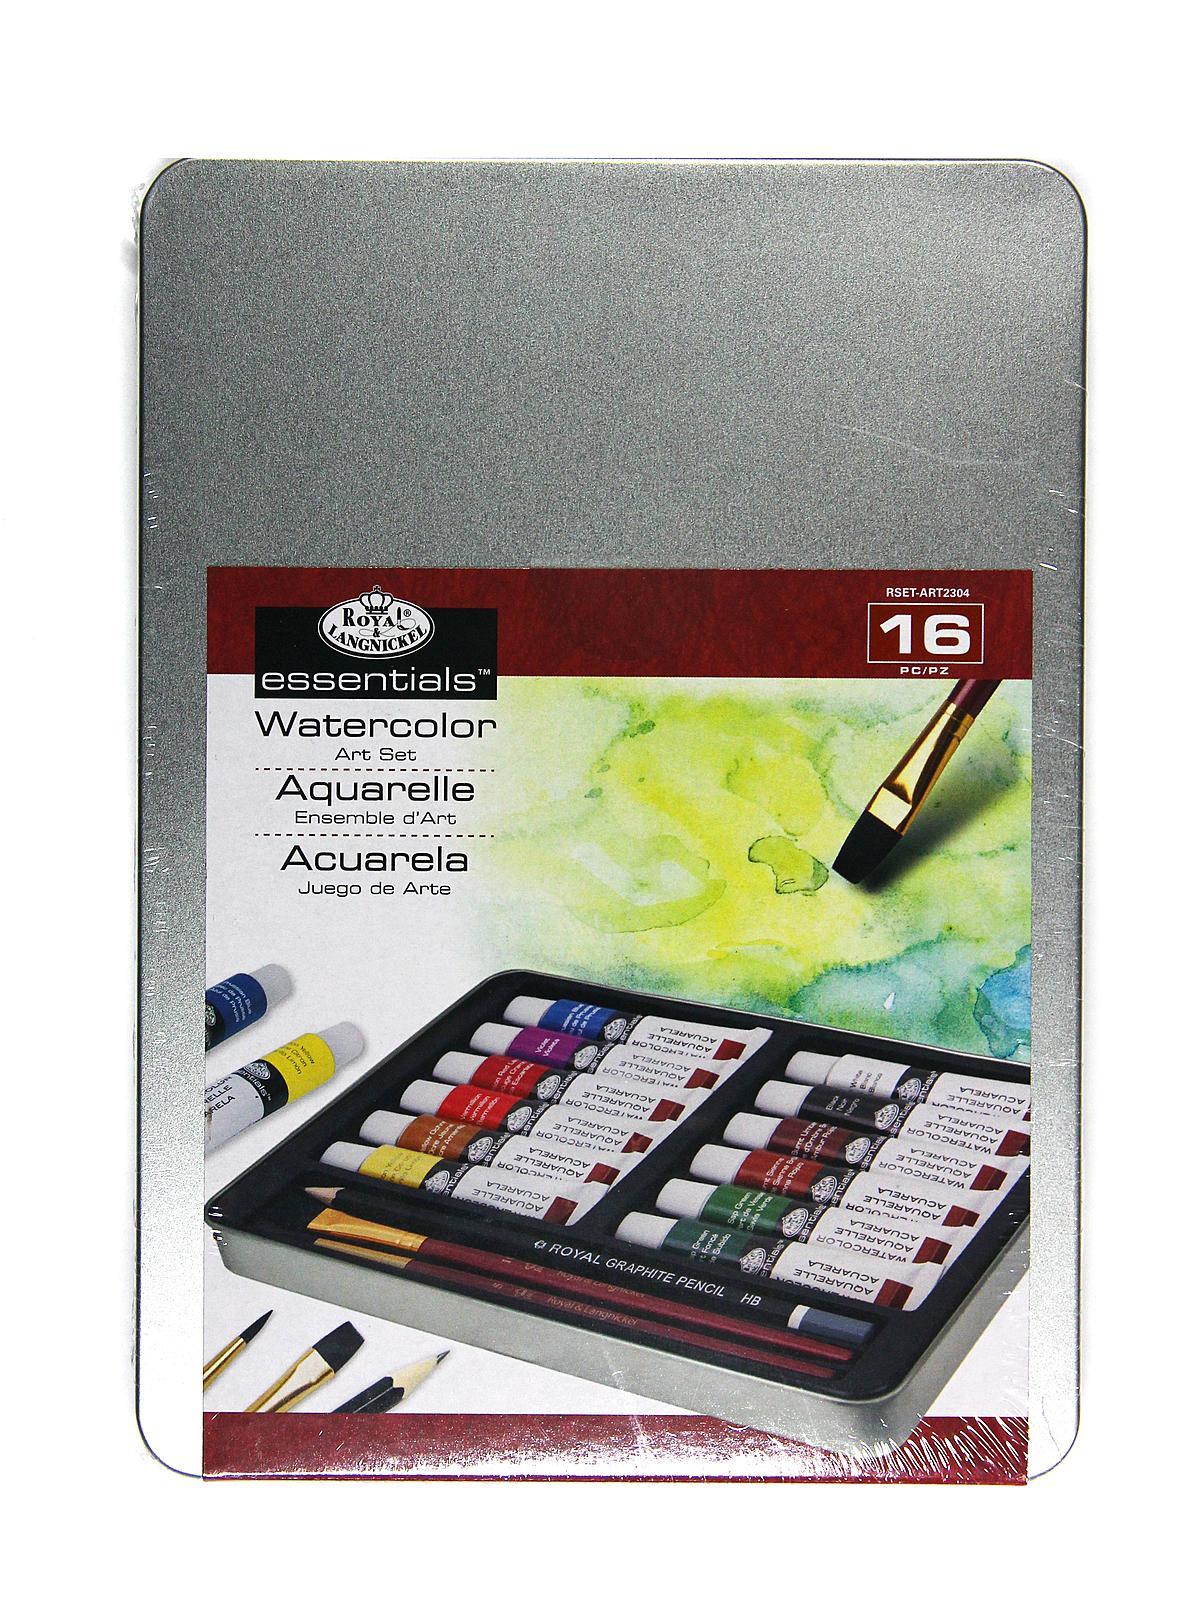 Watercolor Painting Art Set